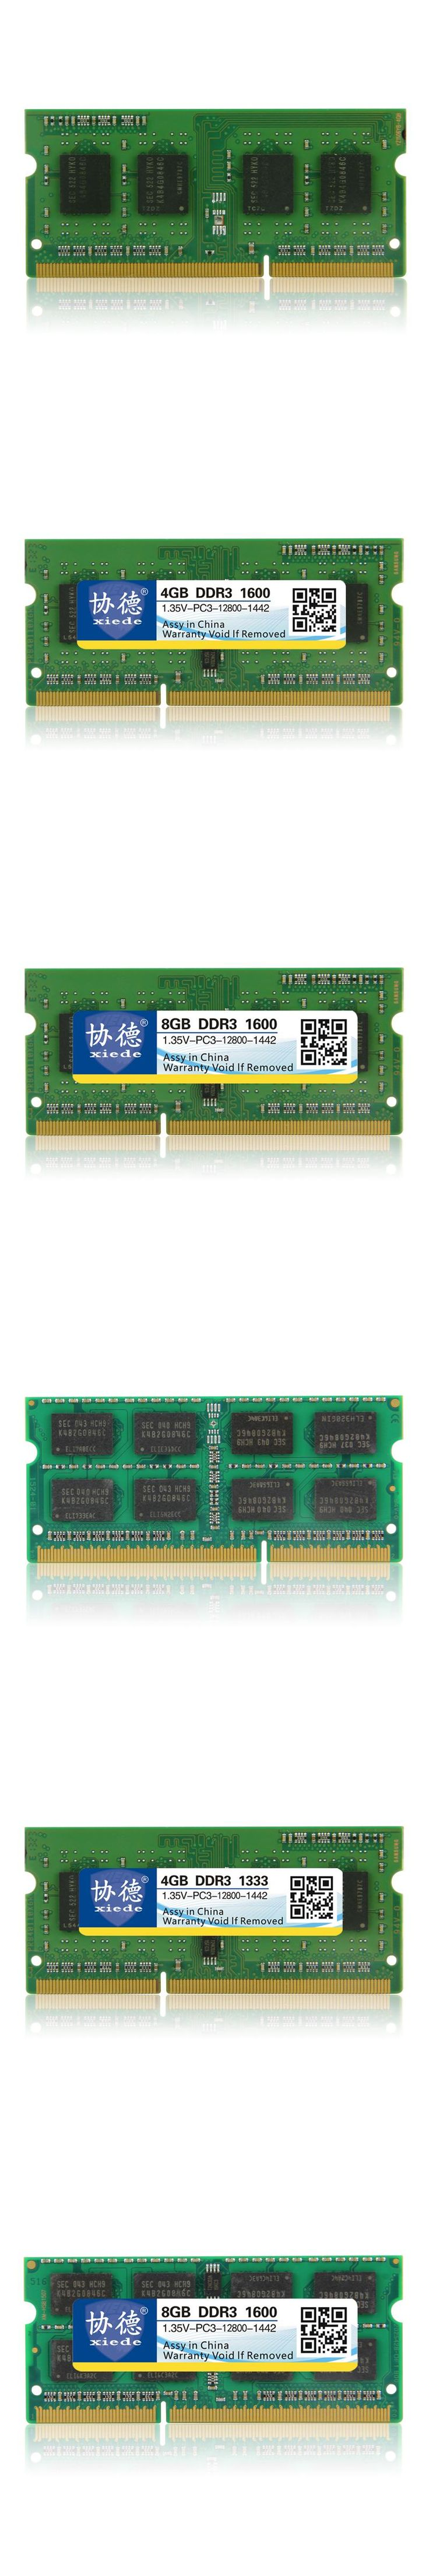 DDR3L Memory Ram 1600Mhz 2GB 4GB 8GB For Laptop Notebook Sodimm Memoria Compatible DDR3 L DDR 3 L 1600 1333 Mhz PC3 12800 1.35V